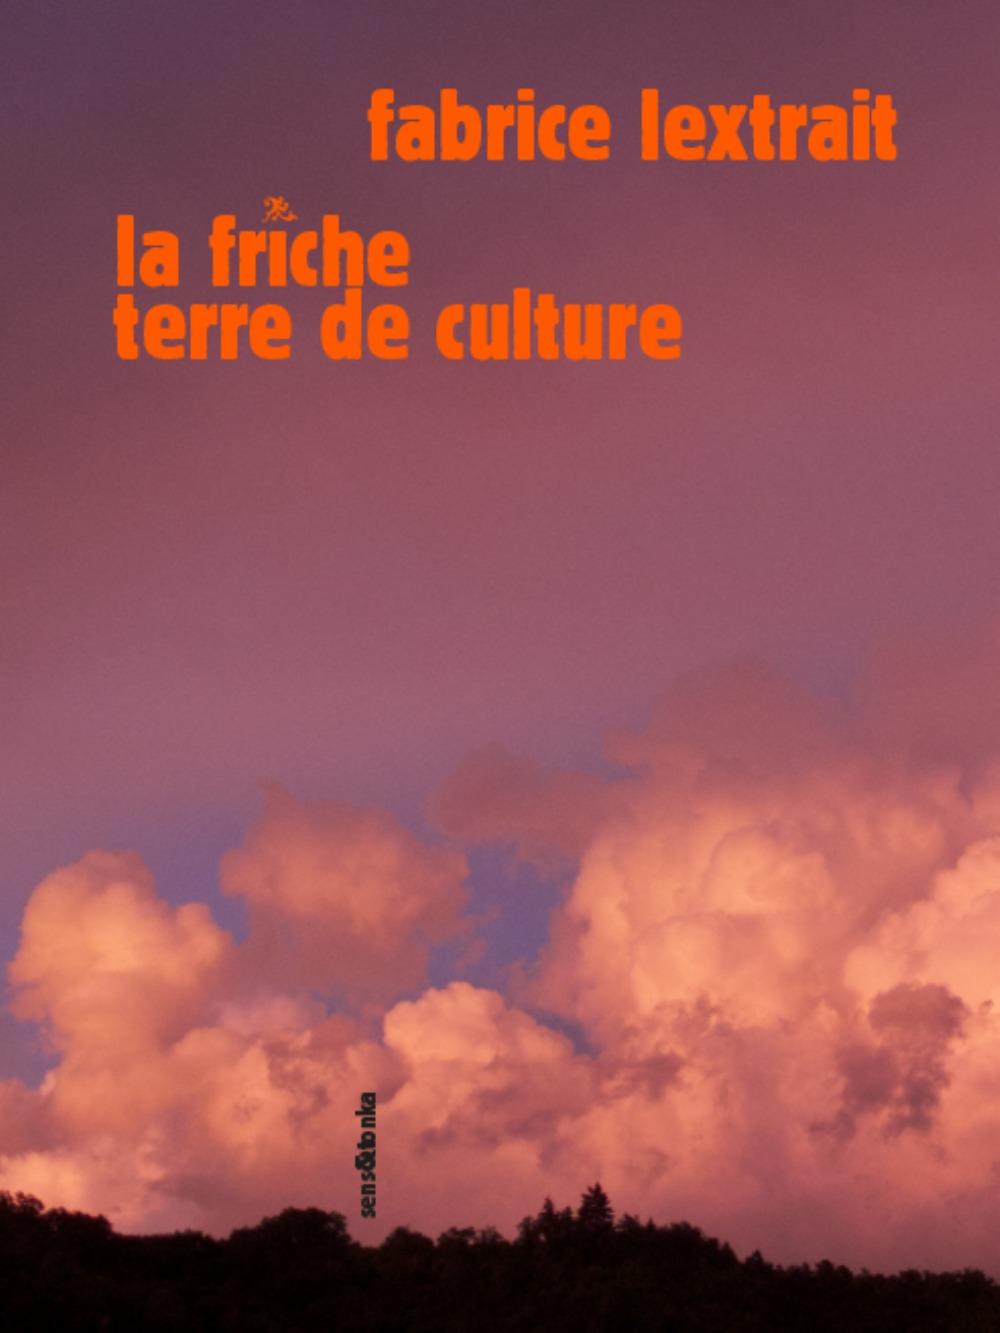 LA FRICHE, TERRE DE CULTURE